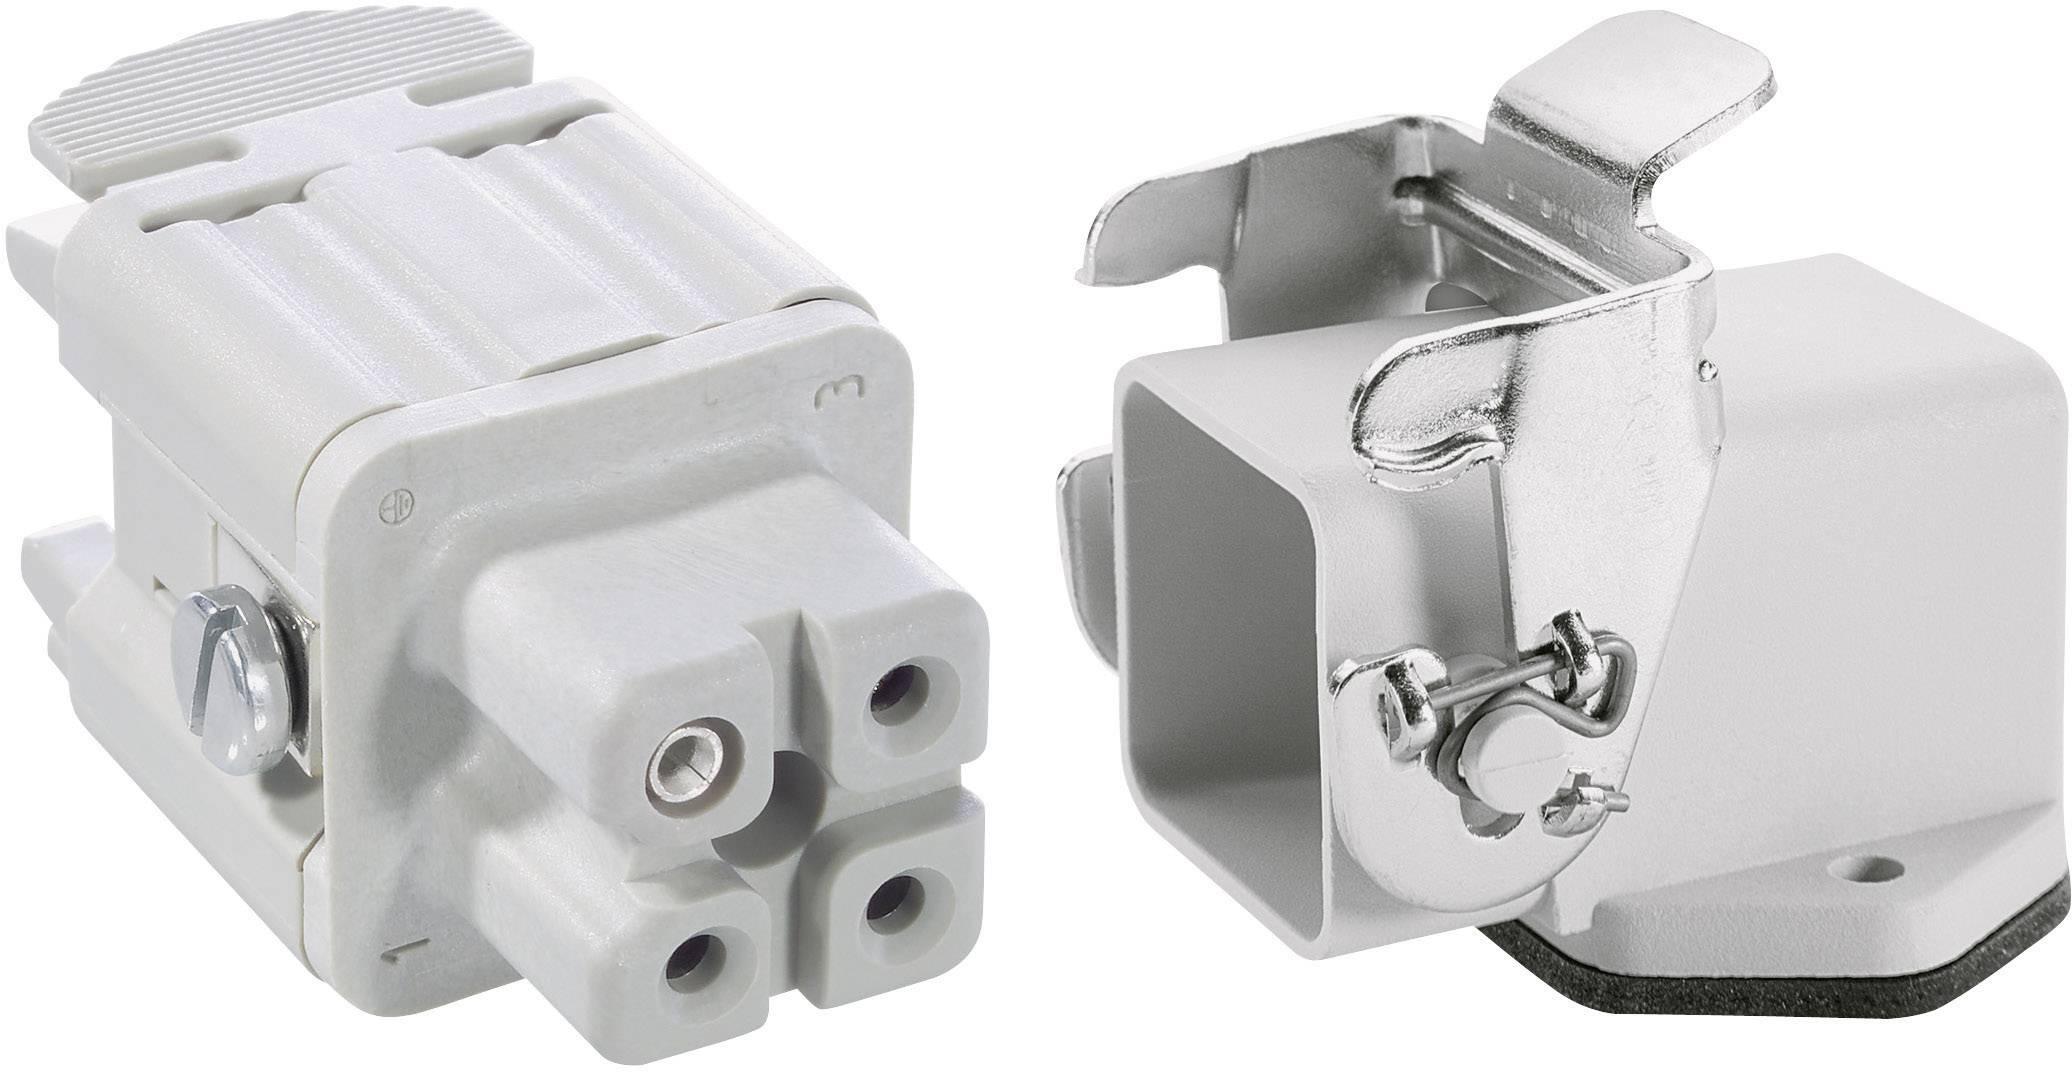 Sada konektoru EPIC®KIT H-A 3 75009607 LAPP 3 + PE šroubovací 1 sada